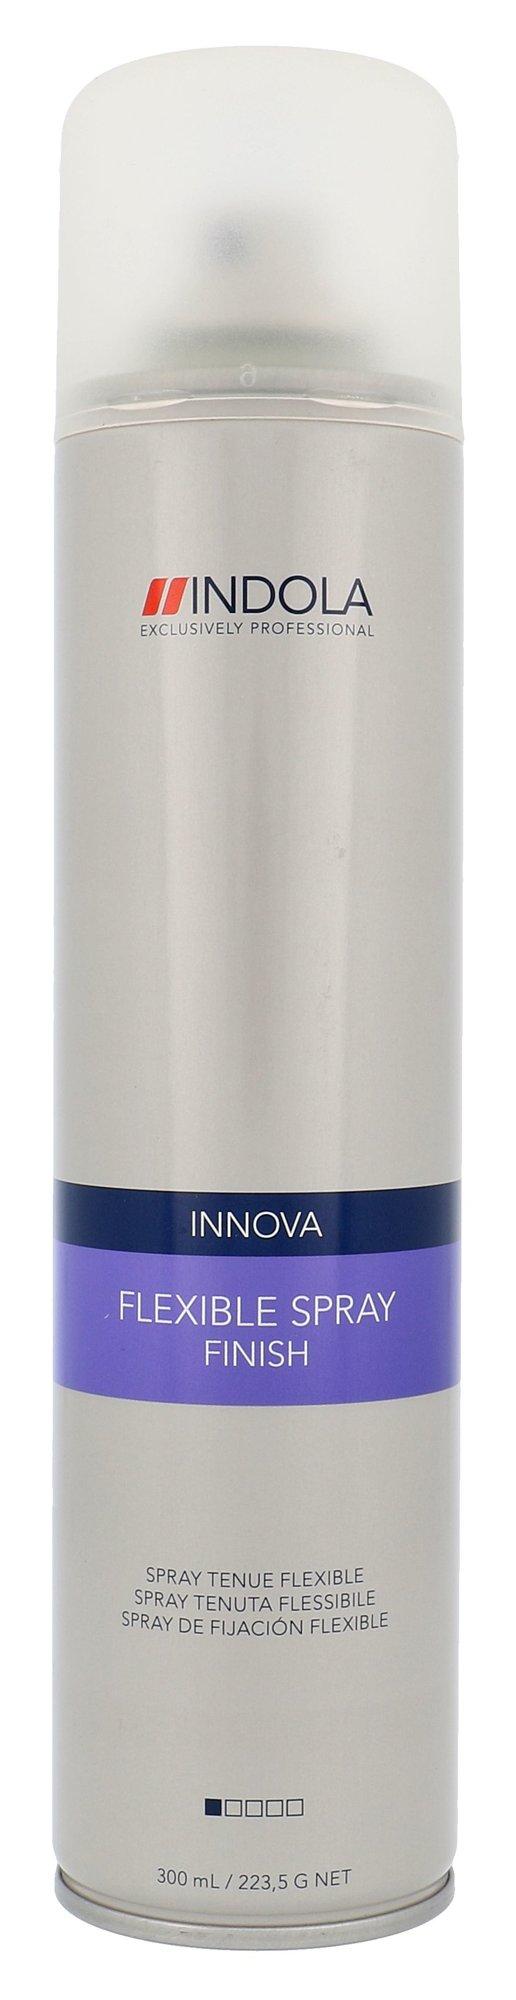 Indola Innova Finish Cosmetic 300ml  Flexible Spray